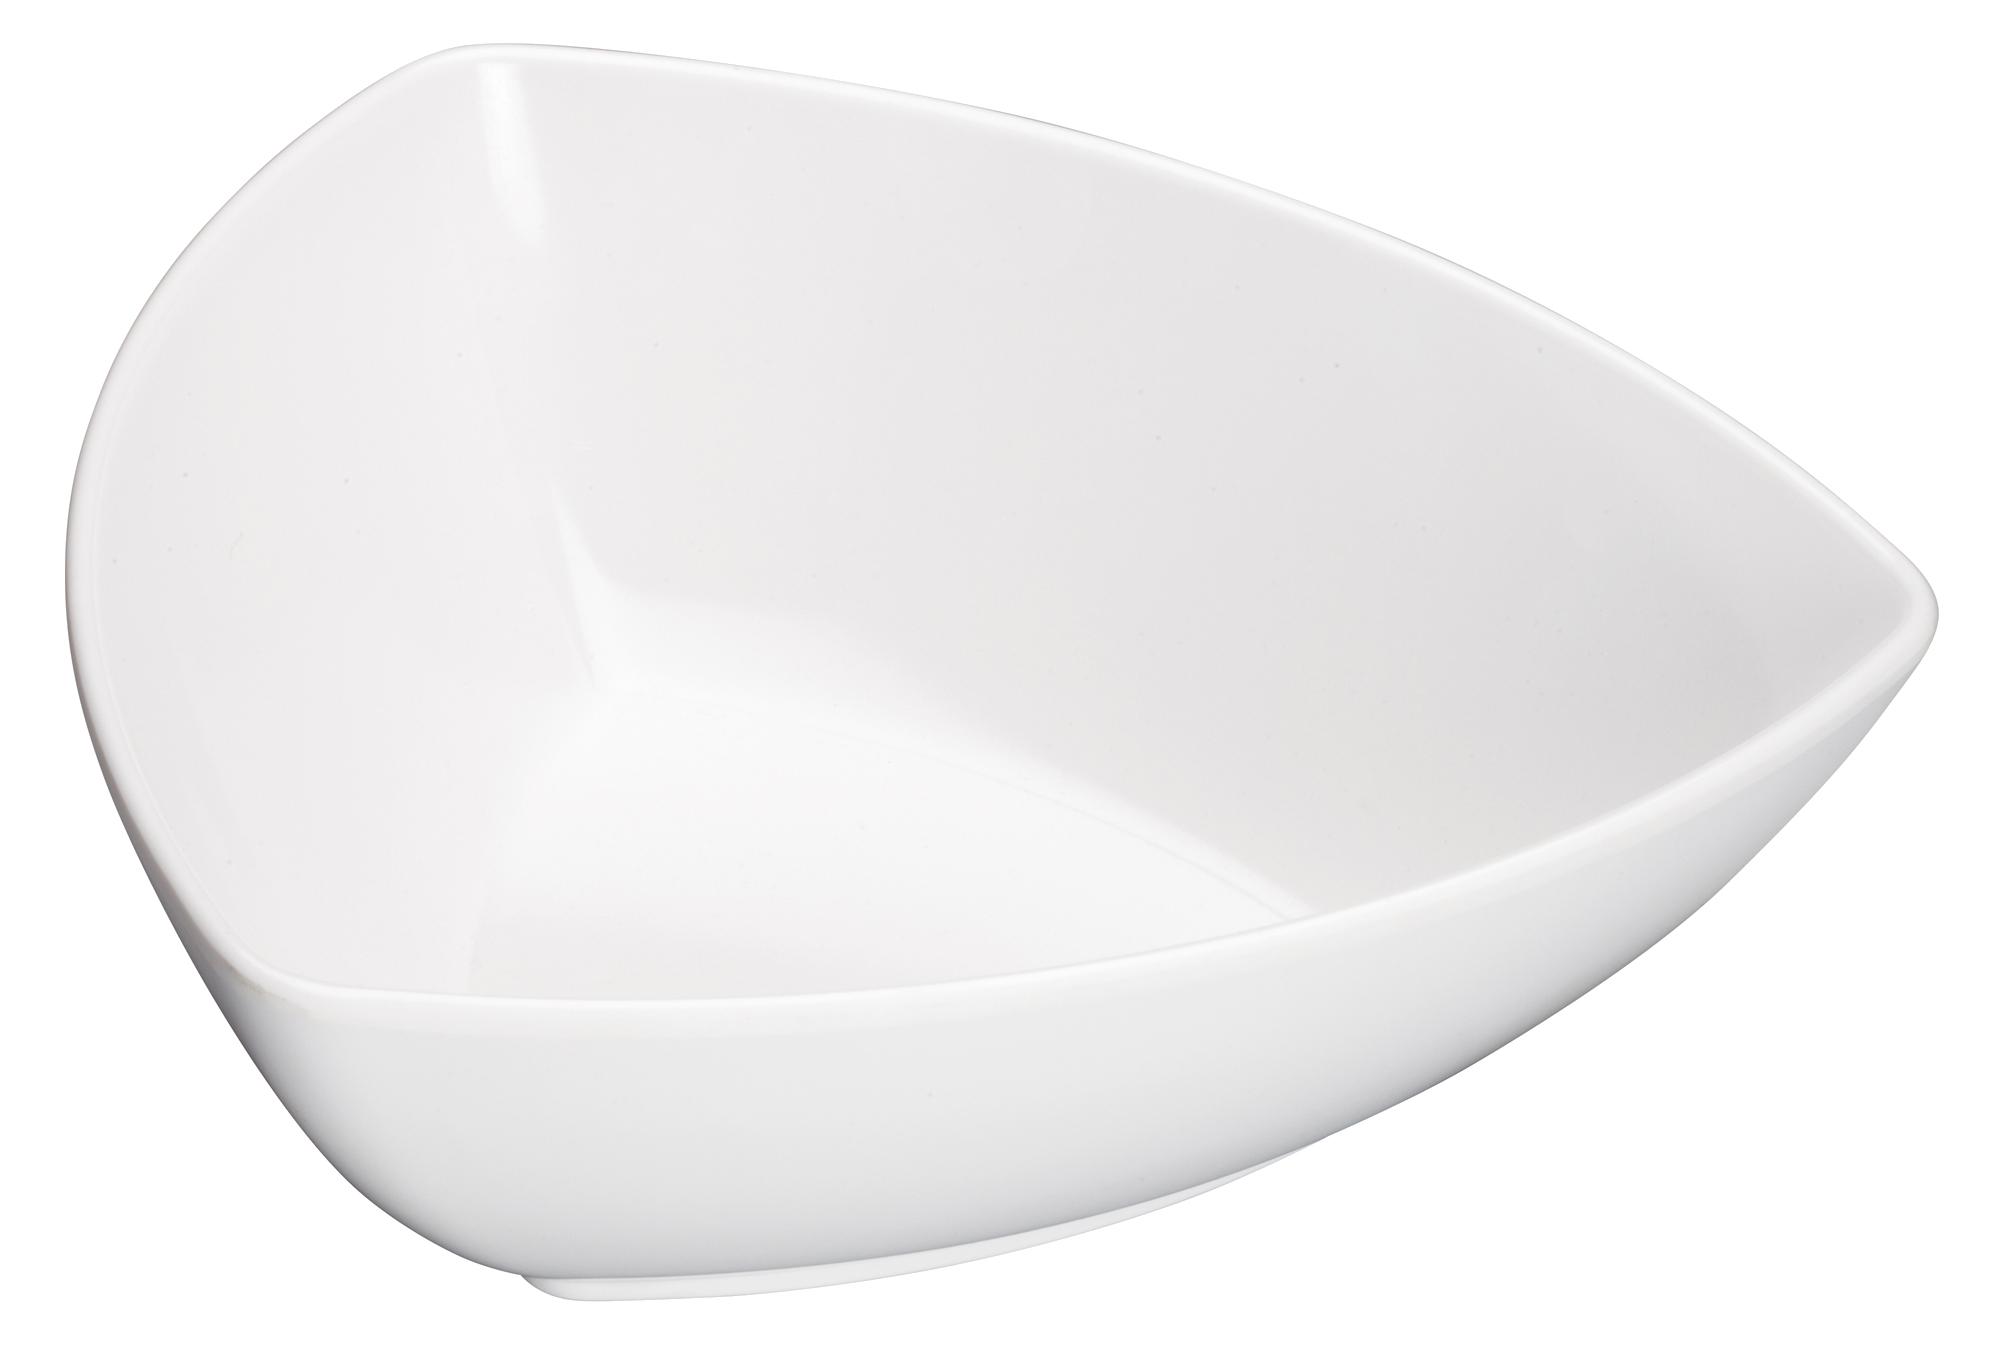 Winco WDM005-202 bowl, plastic,  1 - 2 qt (32 - 95 oz)